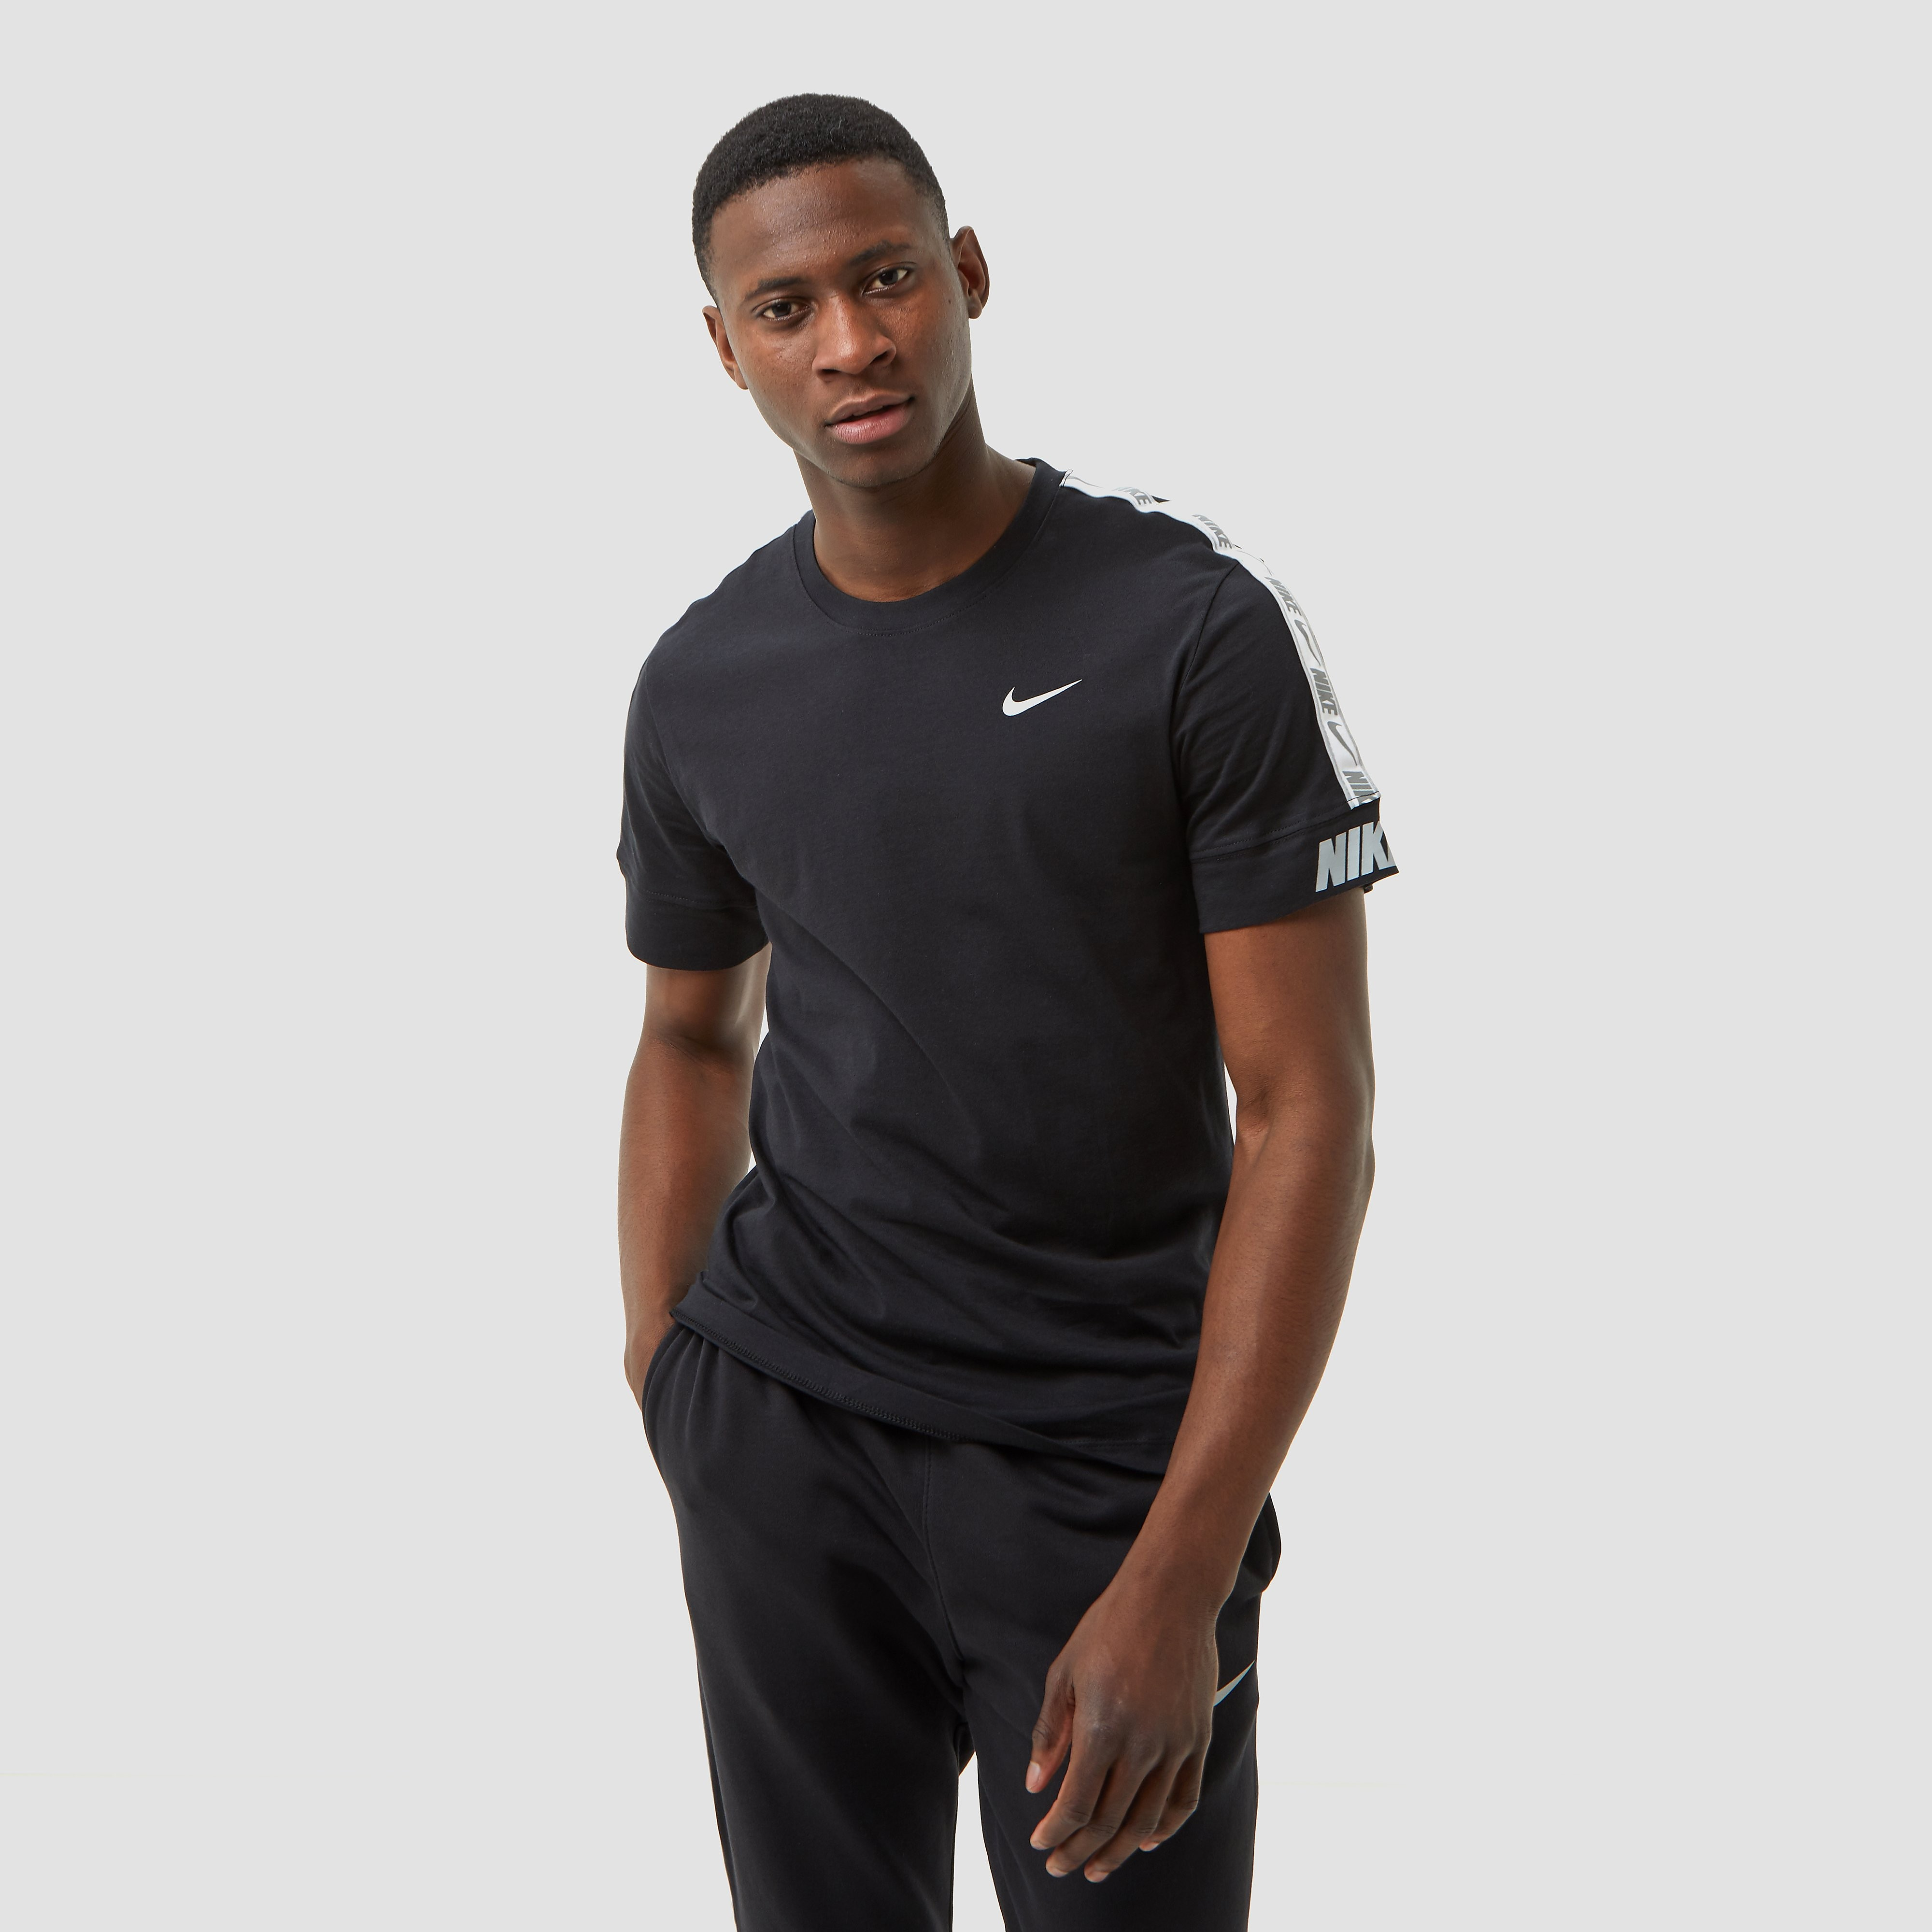 NIKE Sportswear repeat shirt zwart heren Heren